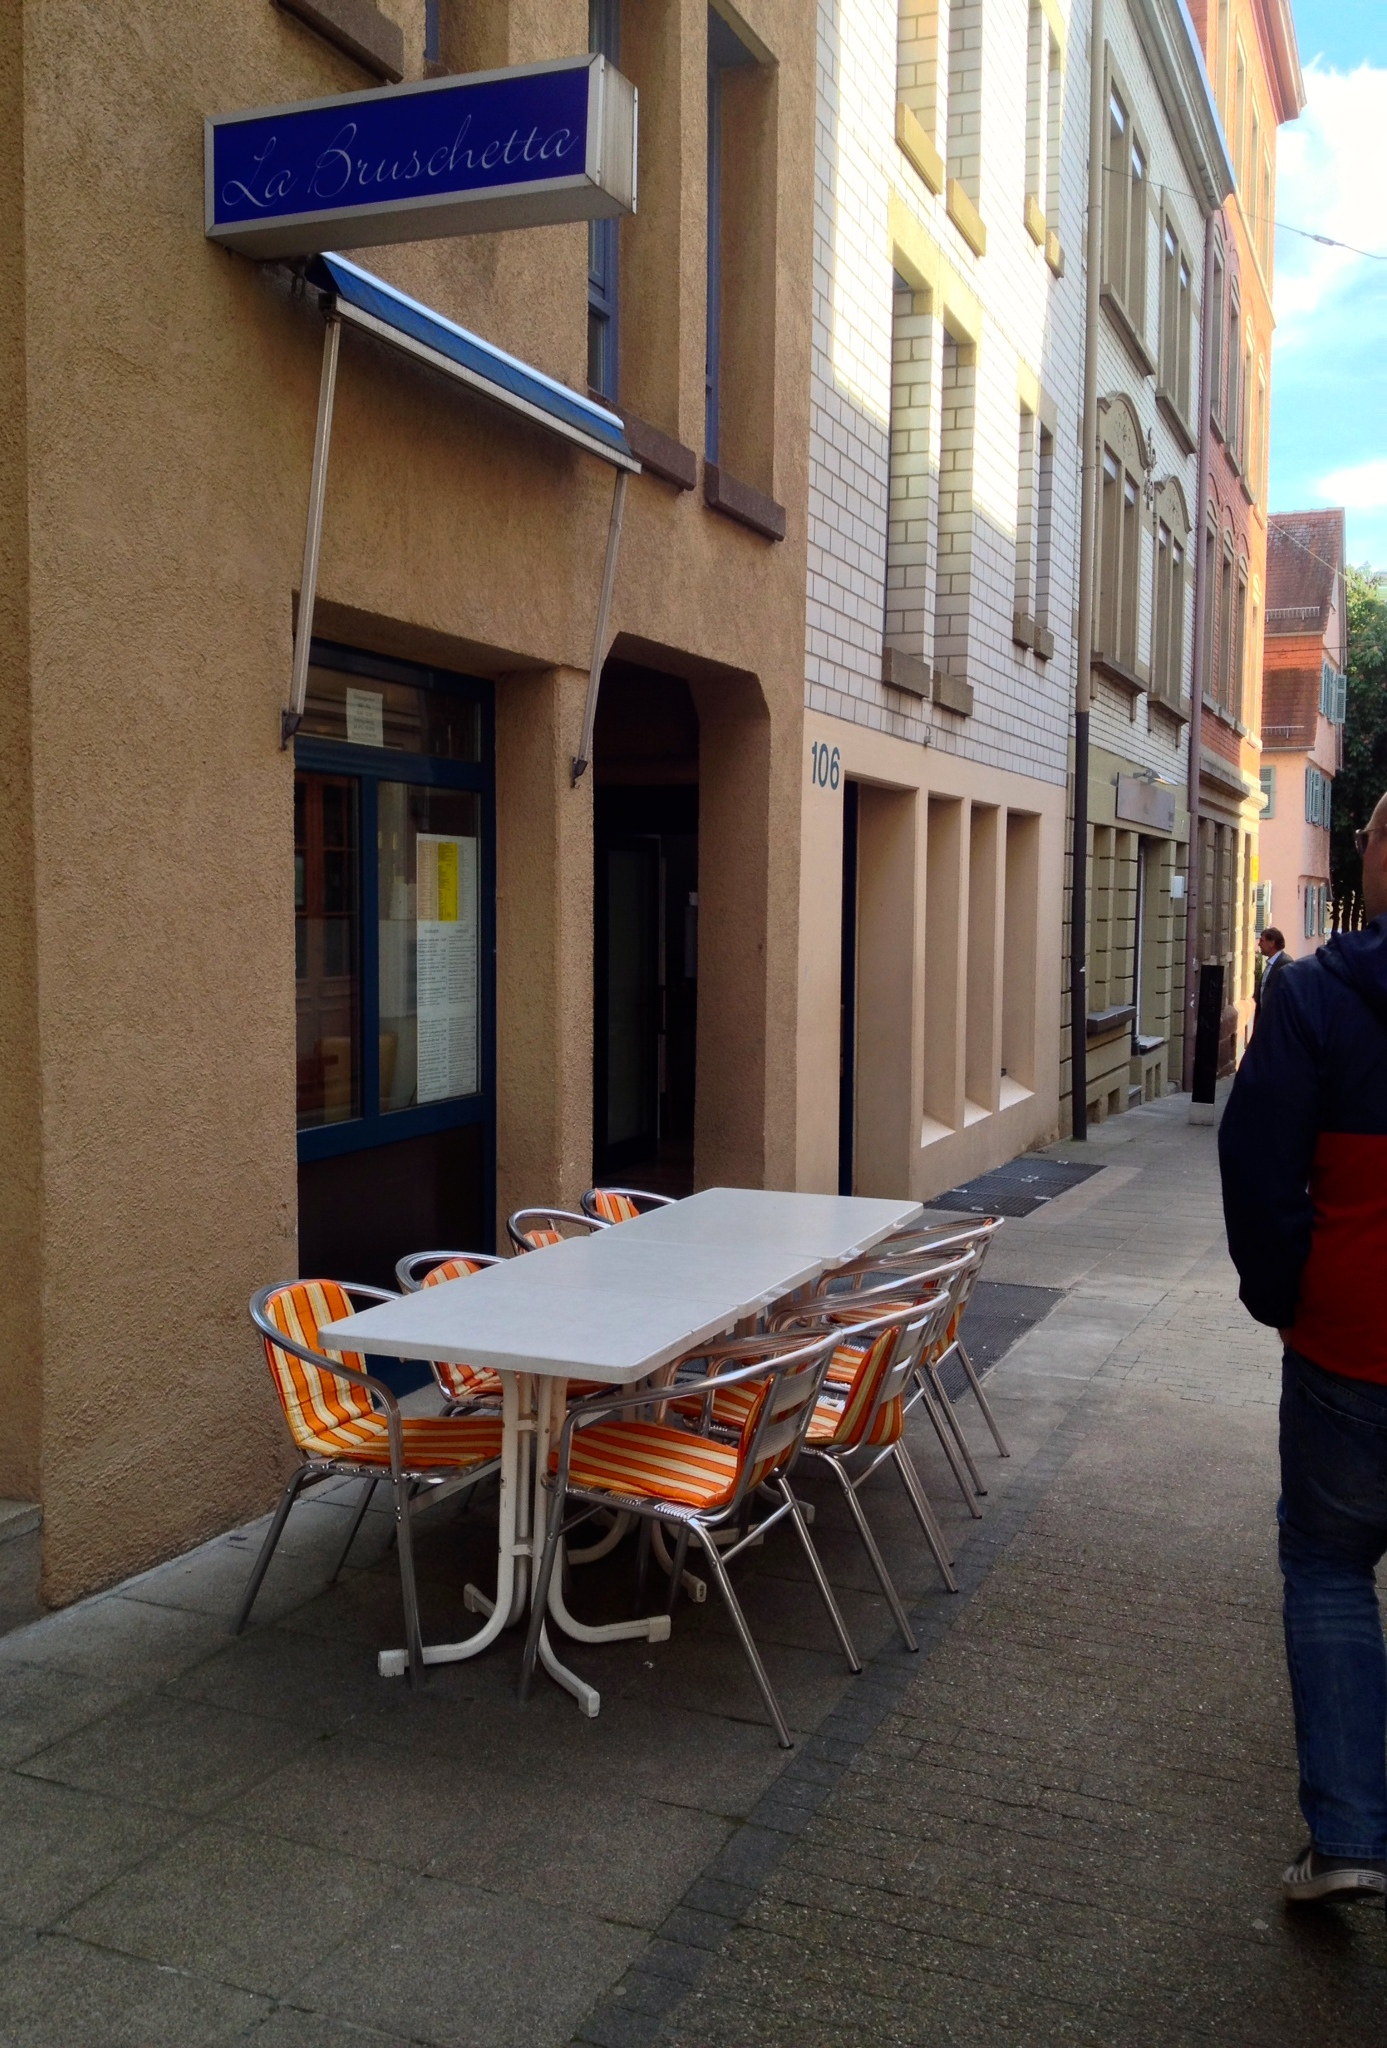 La Bruschetta has a very unassuming restaurant front down a side street.